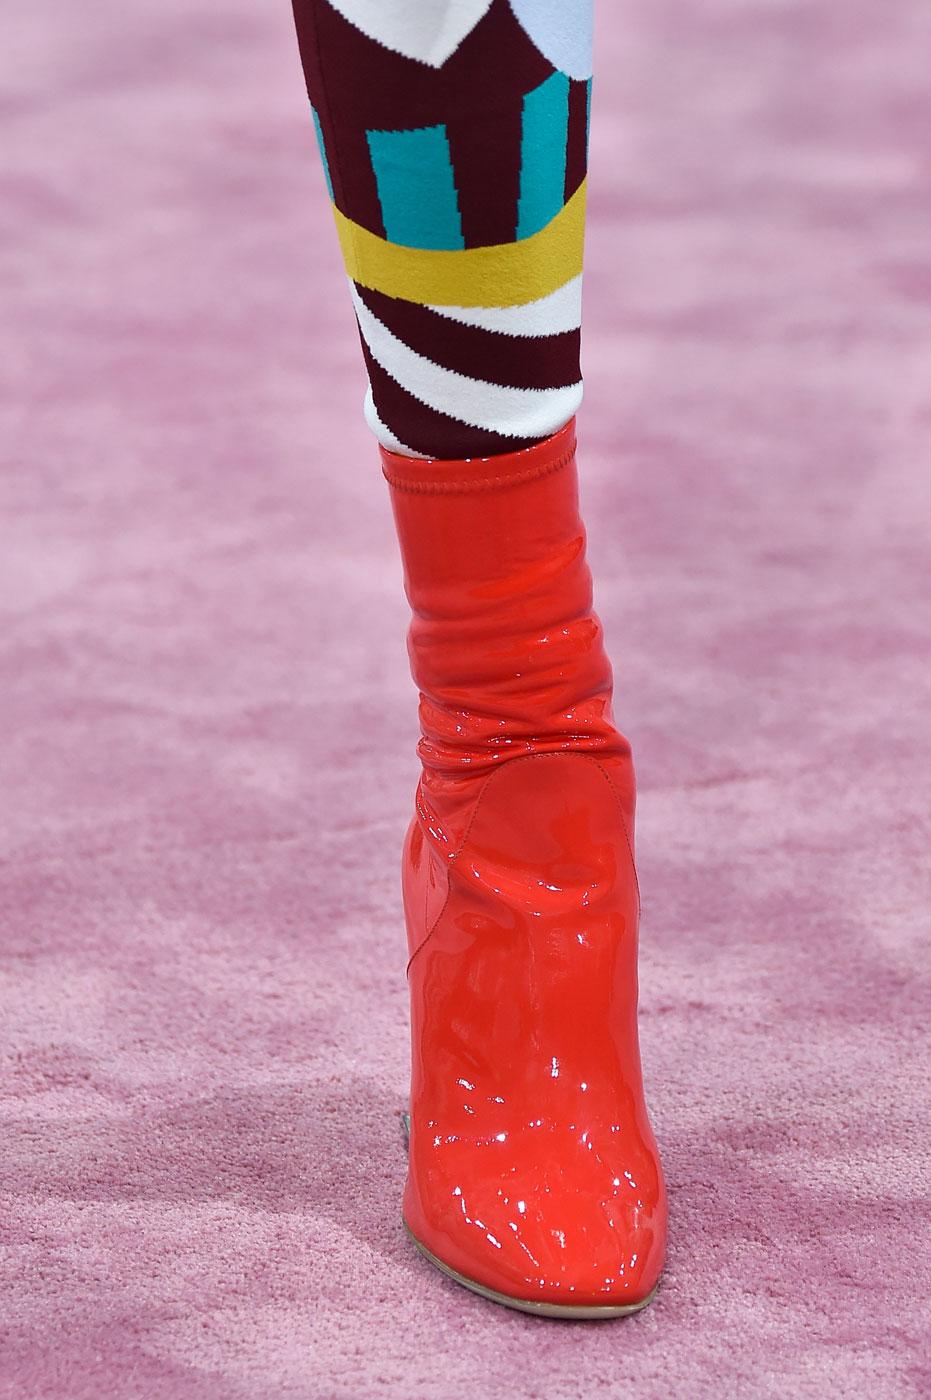 Christian-Dior-fashion-runway-show-close-ups-haute-couture-paris-spring-summer-2015-the-impression-019